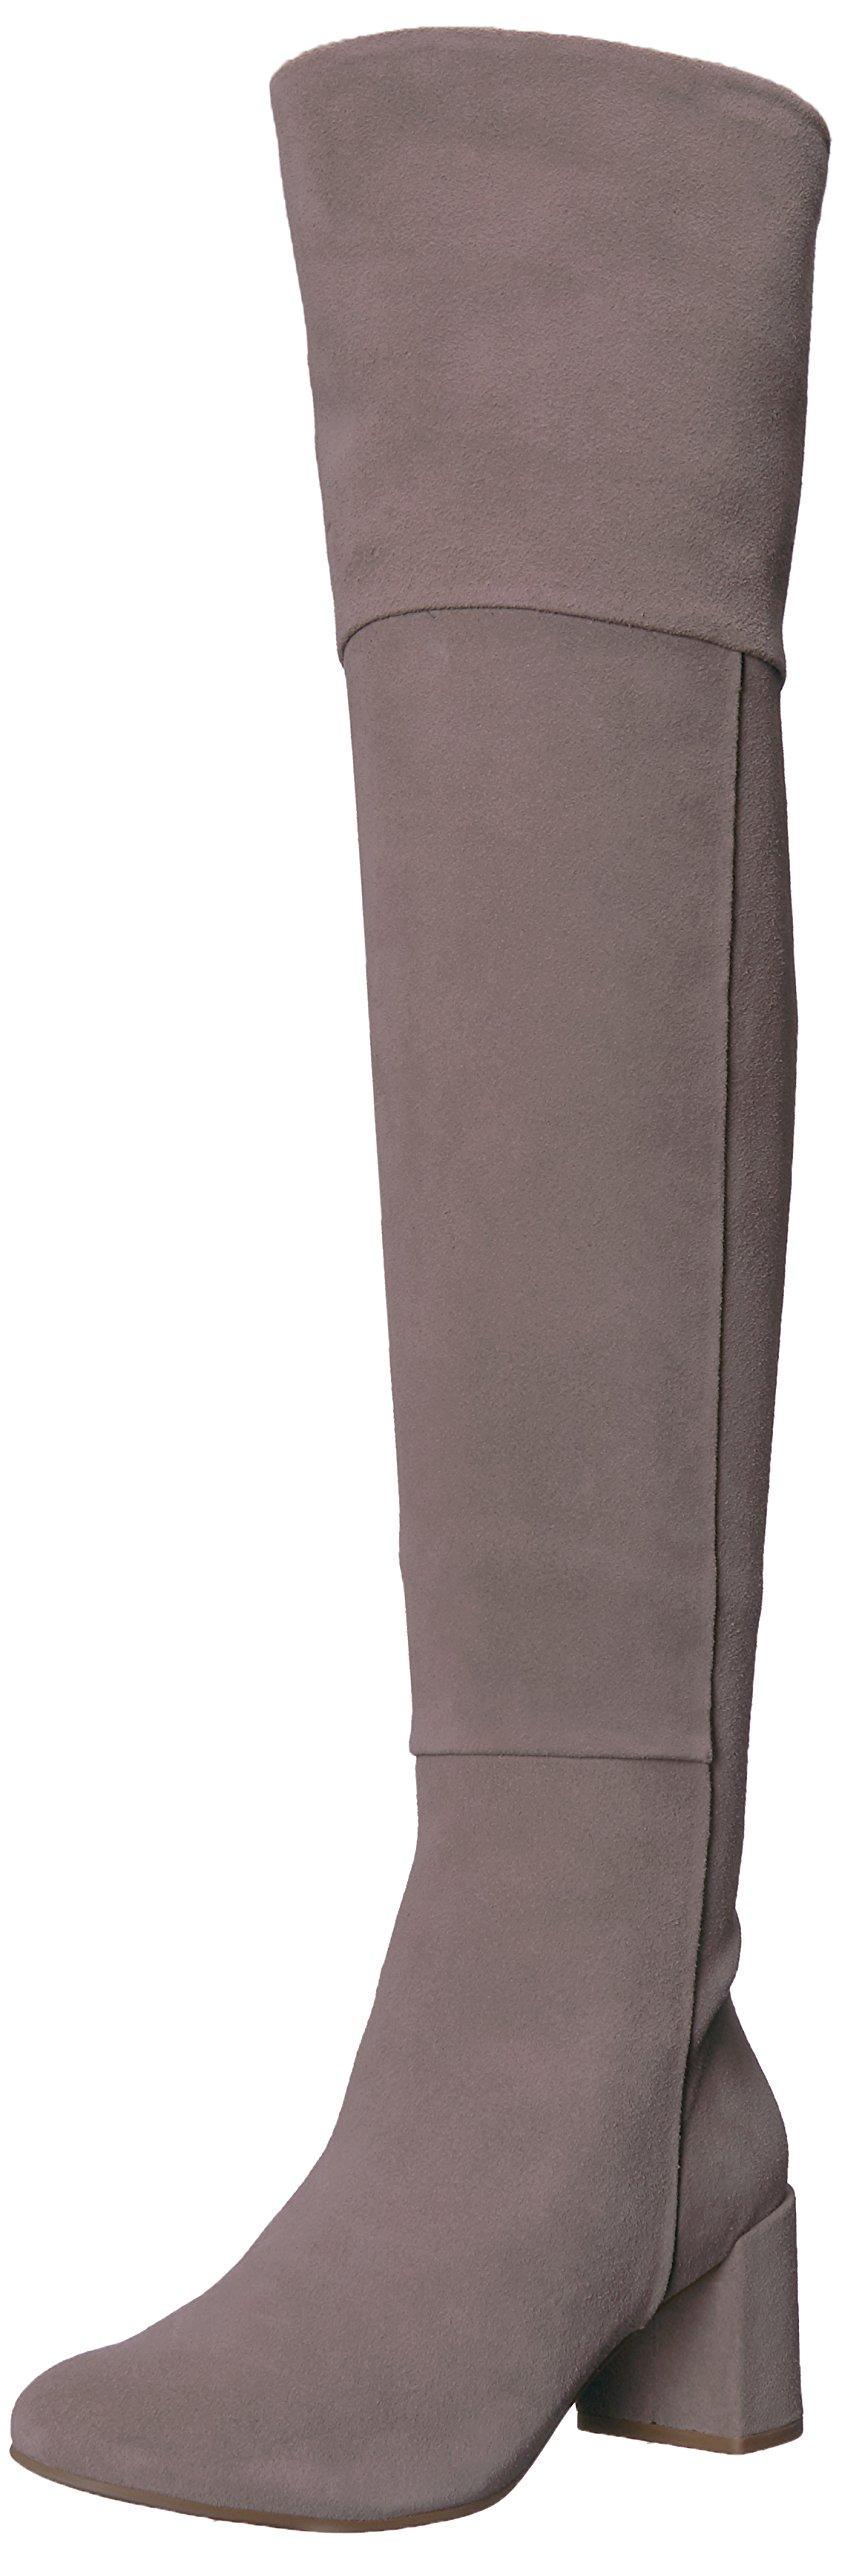 Taryn Rose Women's Catherine Lux Suede Fashion Boot, Grey/Grey, 9 M Medium US